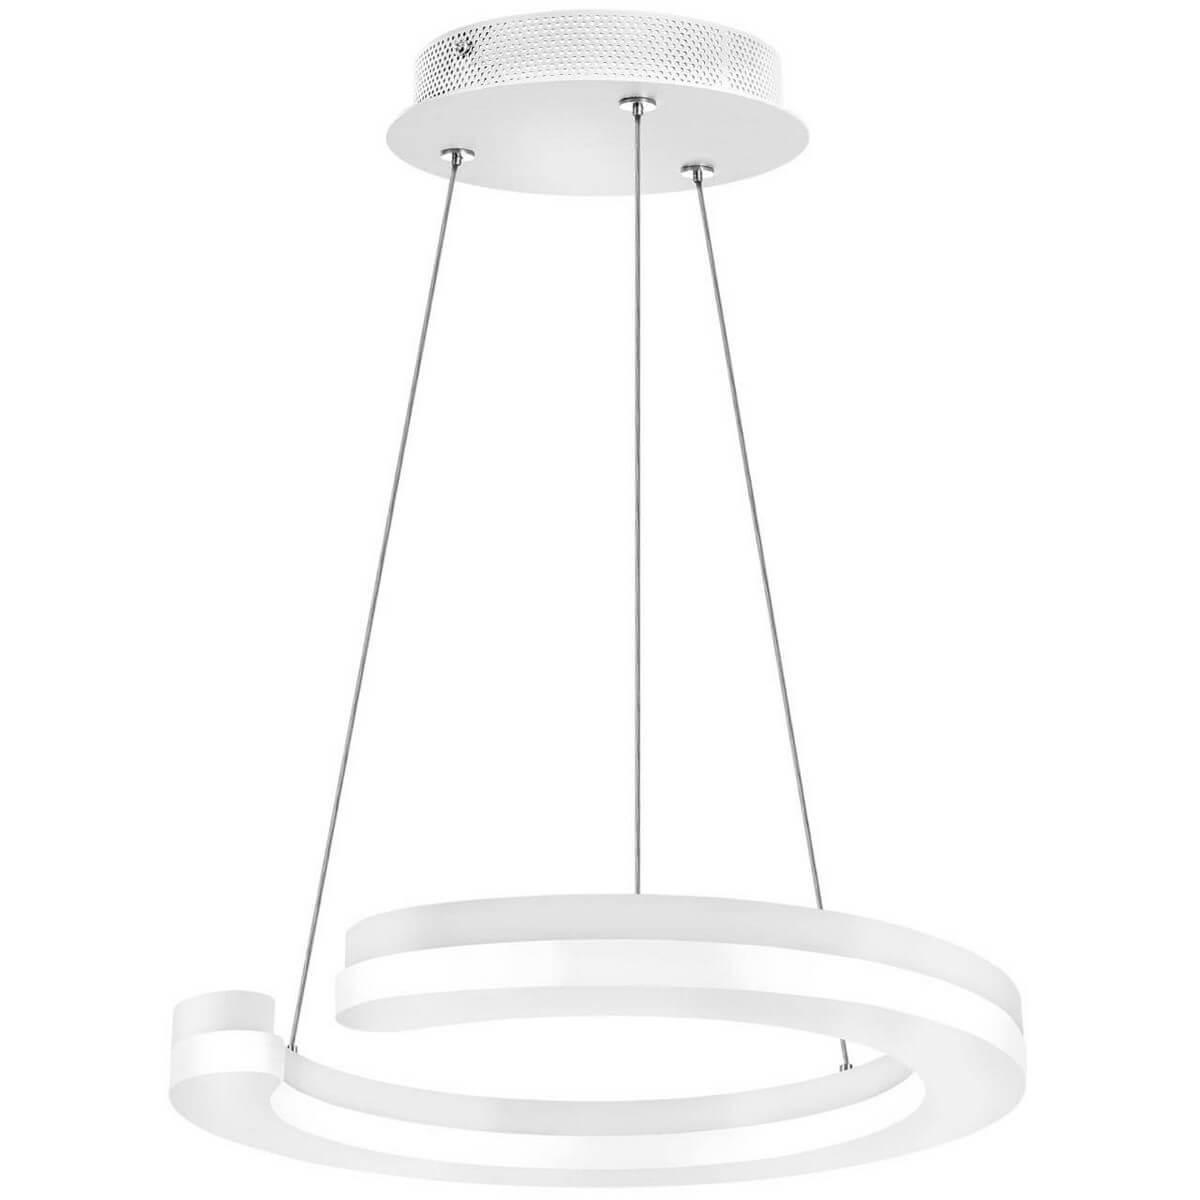 Светильник Lightstar 763246 Unitario подвесной светильник unitario 763246